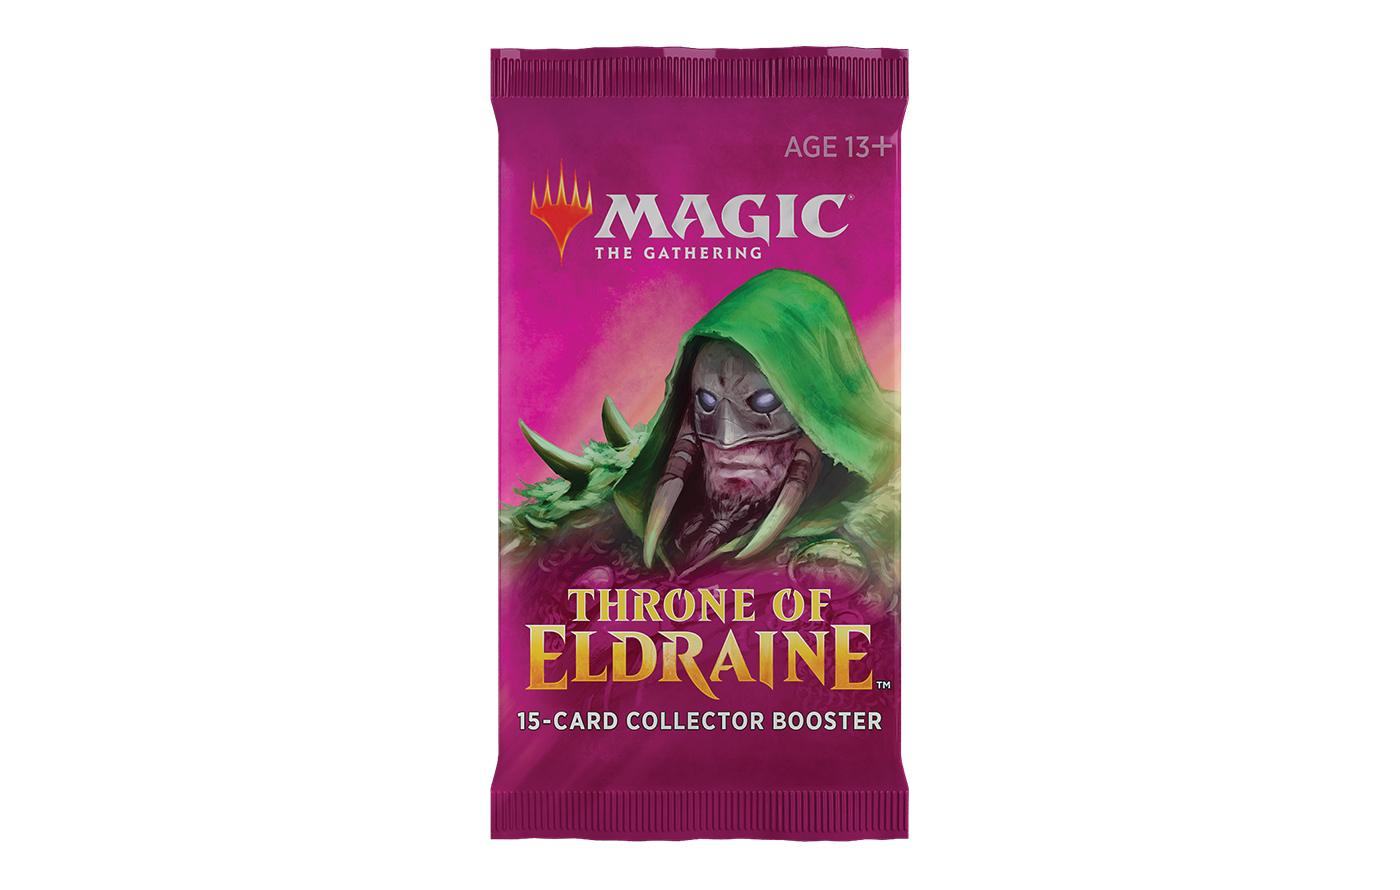 Throne of Eldraine at Star City Games